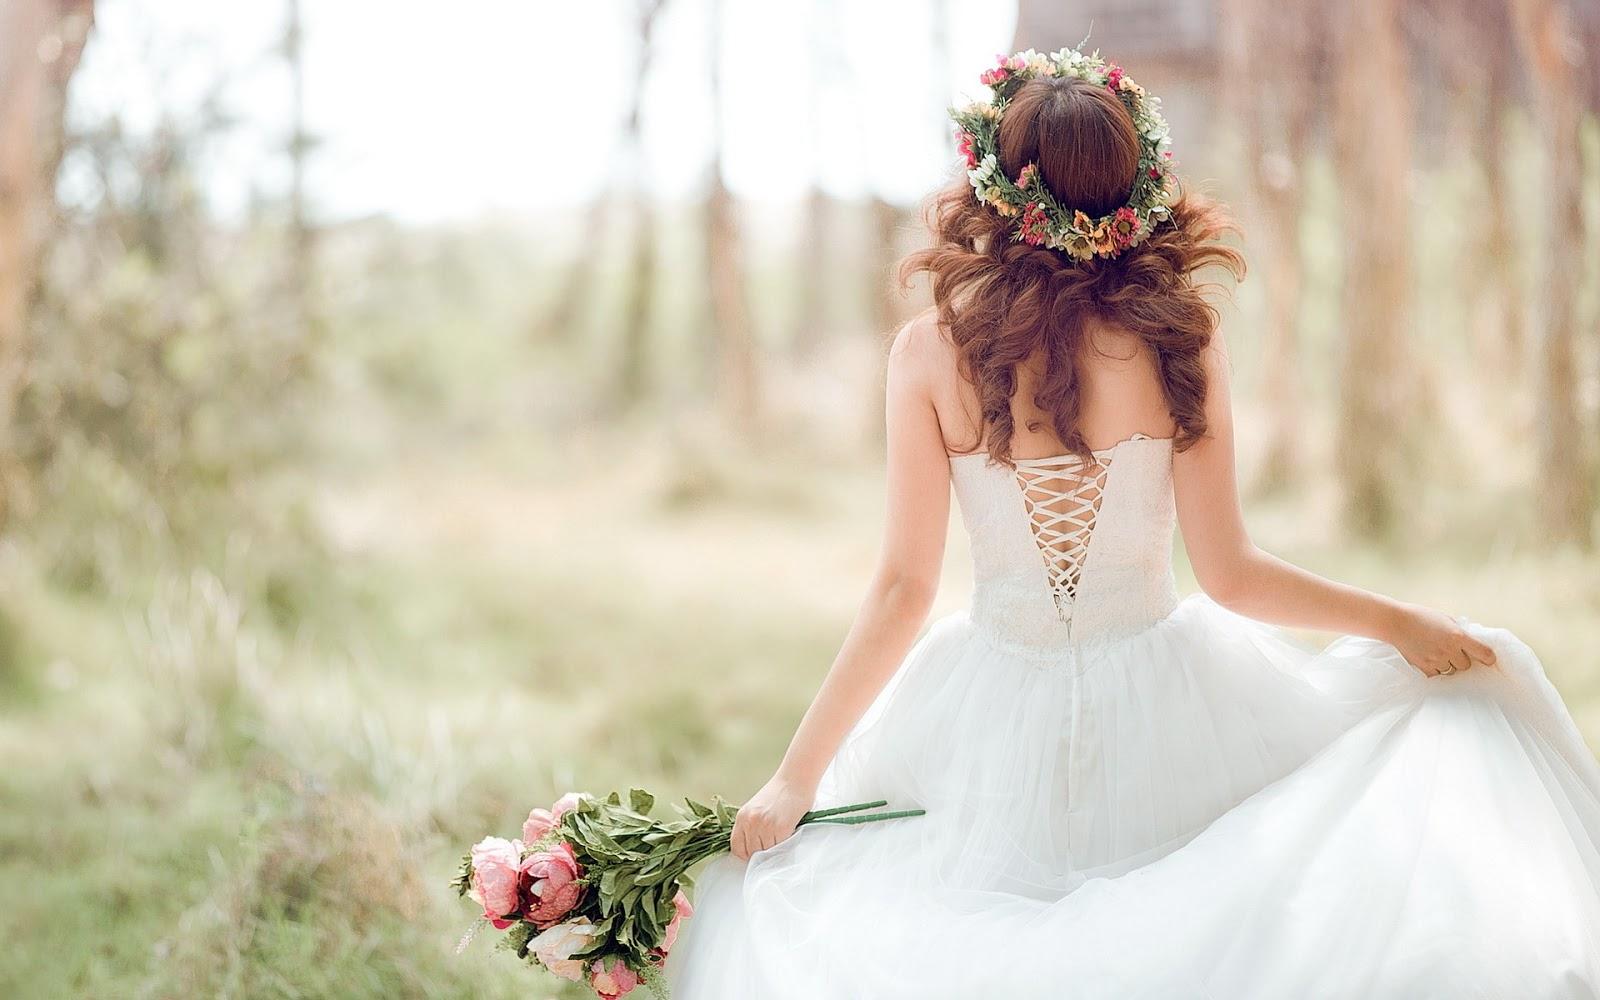 Confira 6 modelos de Vestidos de Noiva